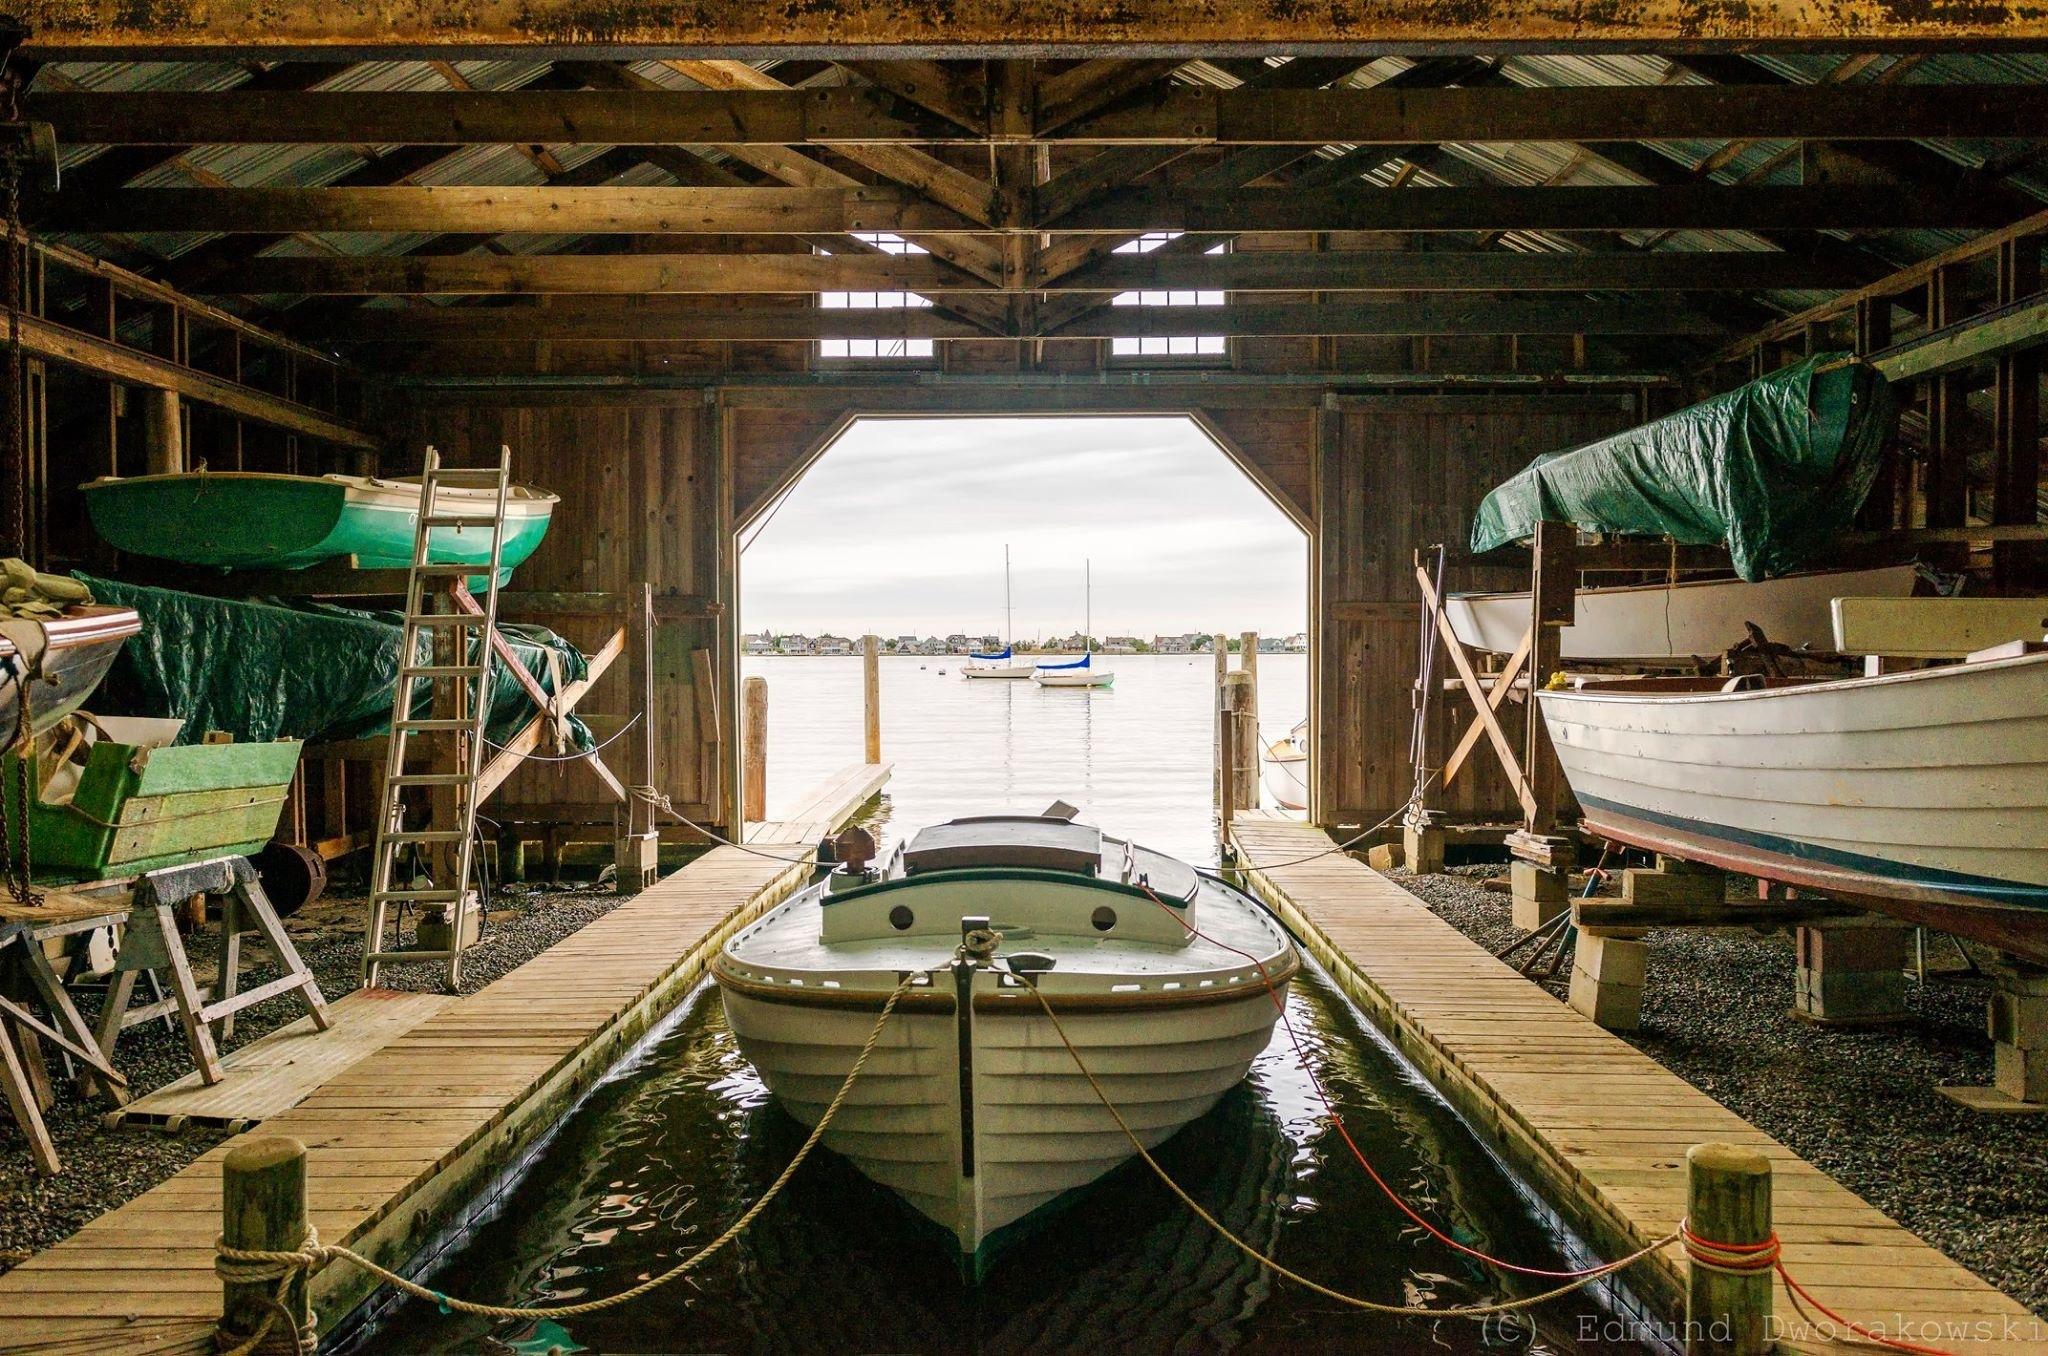 Beaton's Boathouse by Edmund Dworakowski